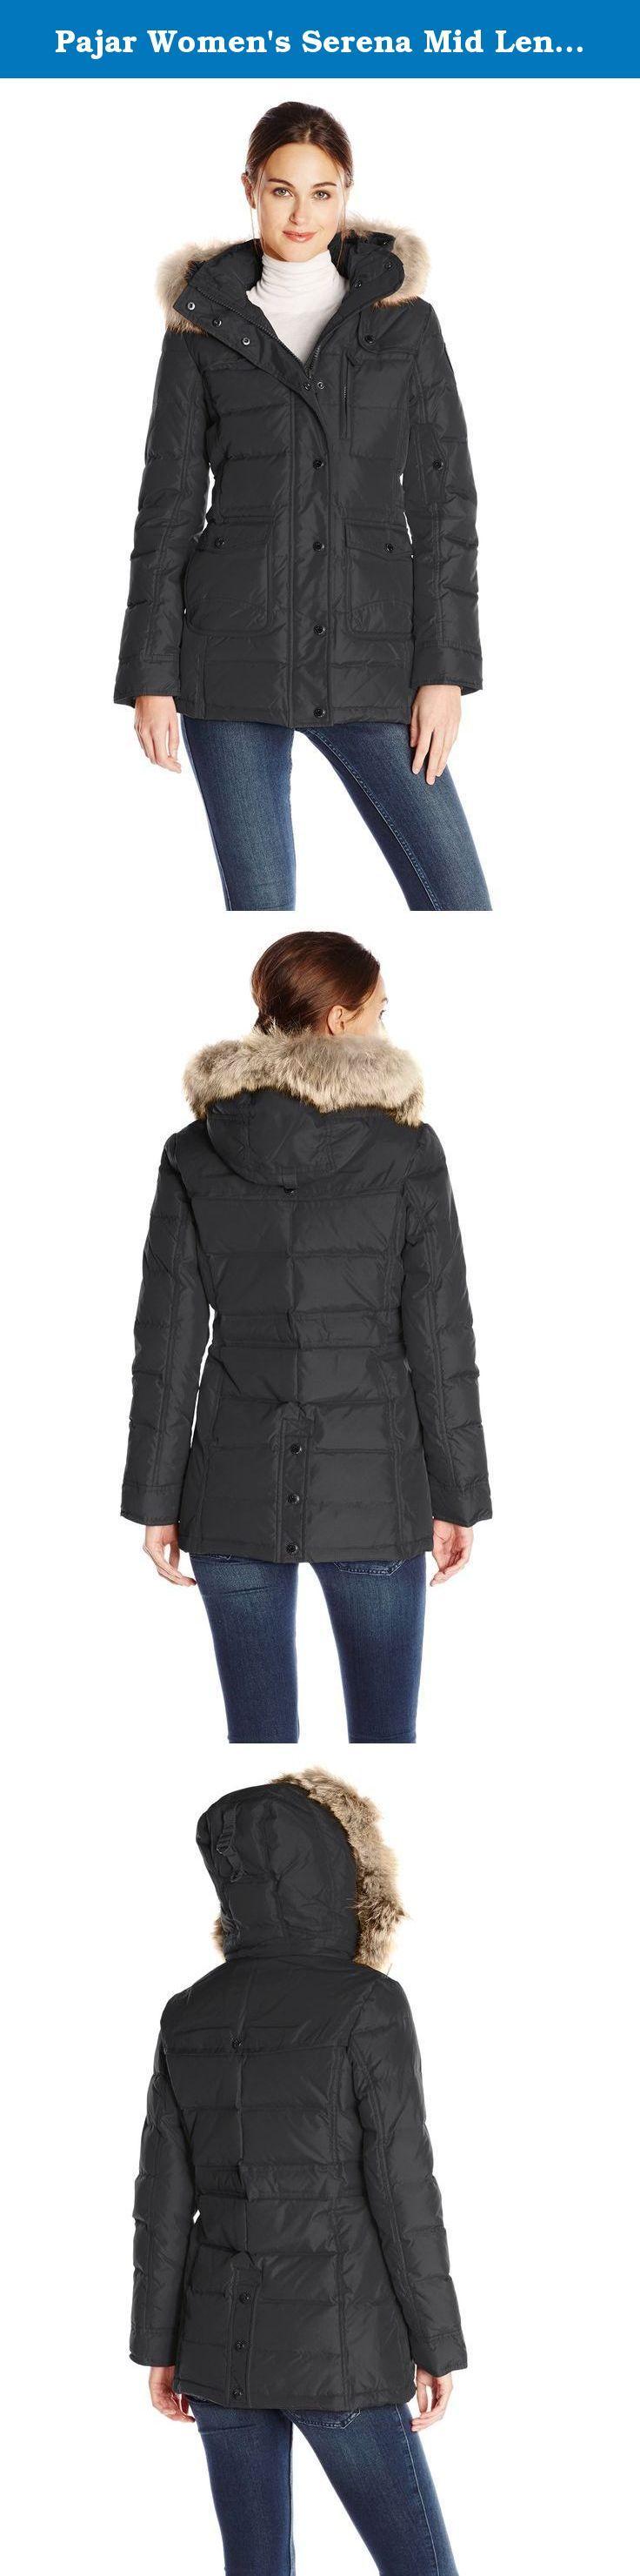 Pajar Women's Serena Mid Length Down Parka with Fur Hood, Black, Large. Ladies mid length jacket.